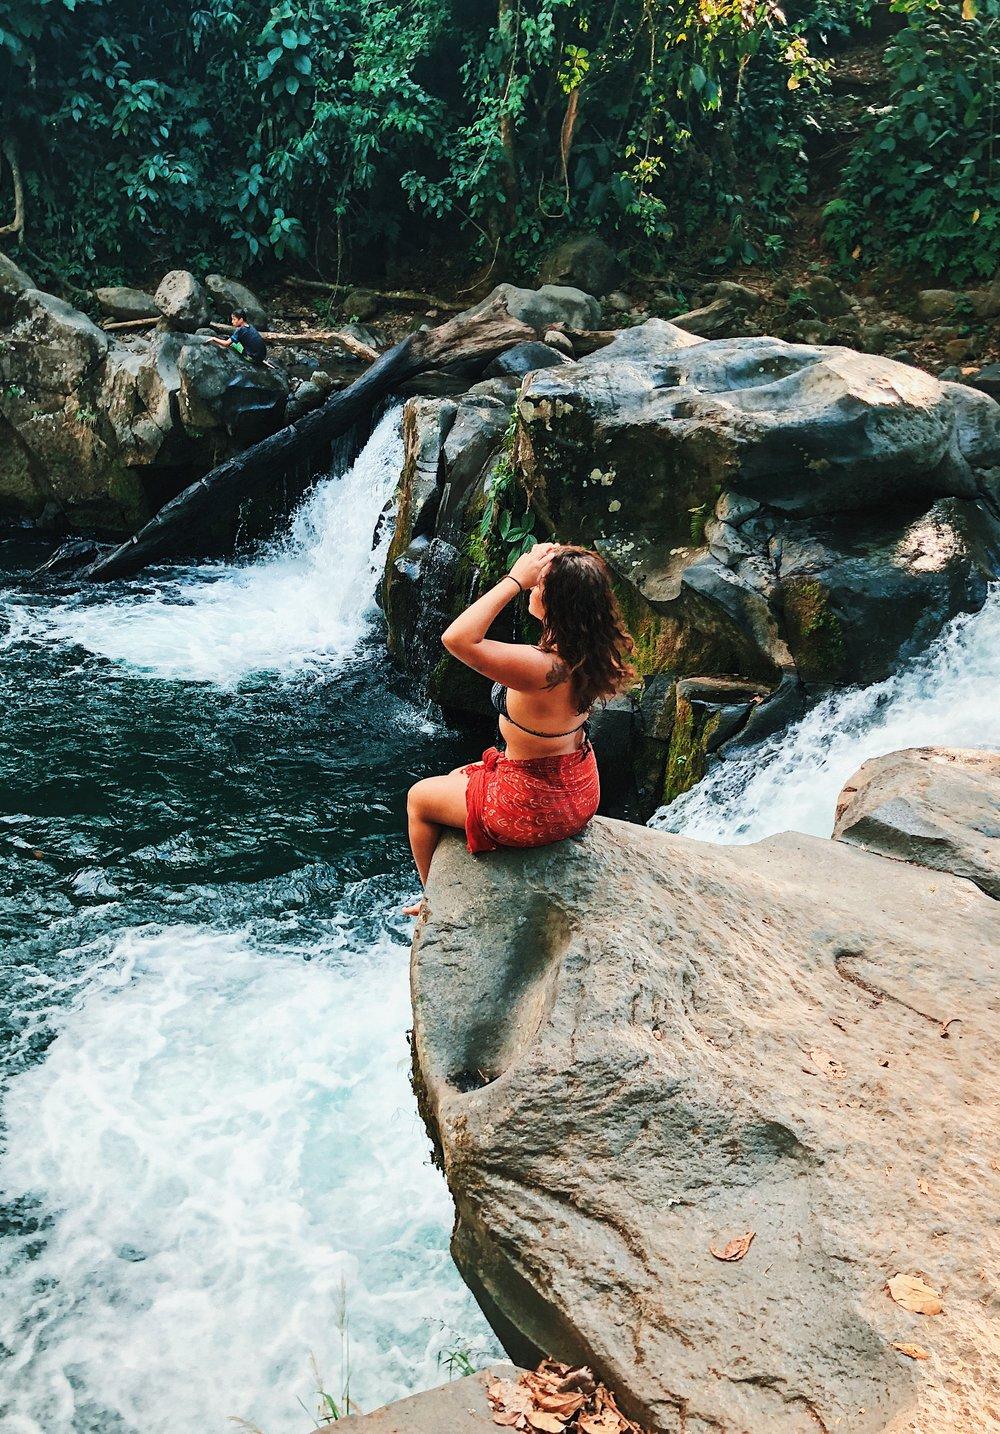 ambarjanuel_costarica_digitalnomad_lafortuna_arenal_travelblogger_ambar_puravida16.jpg